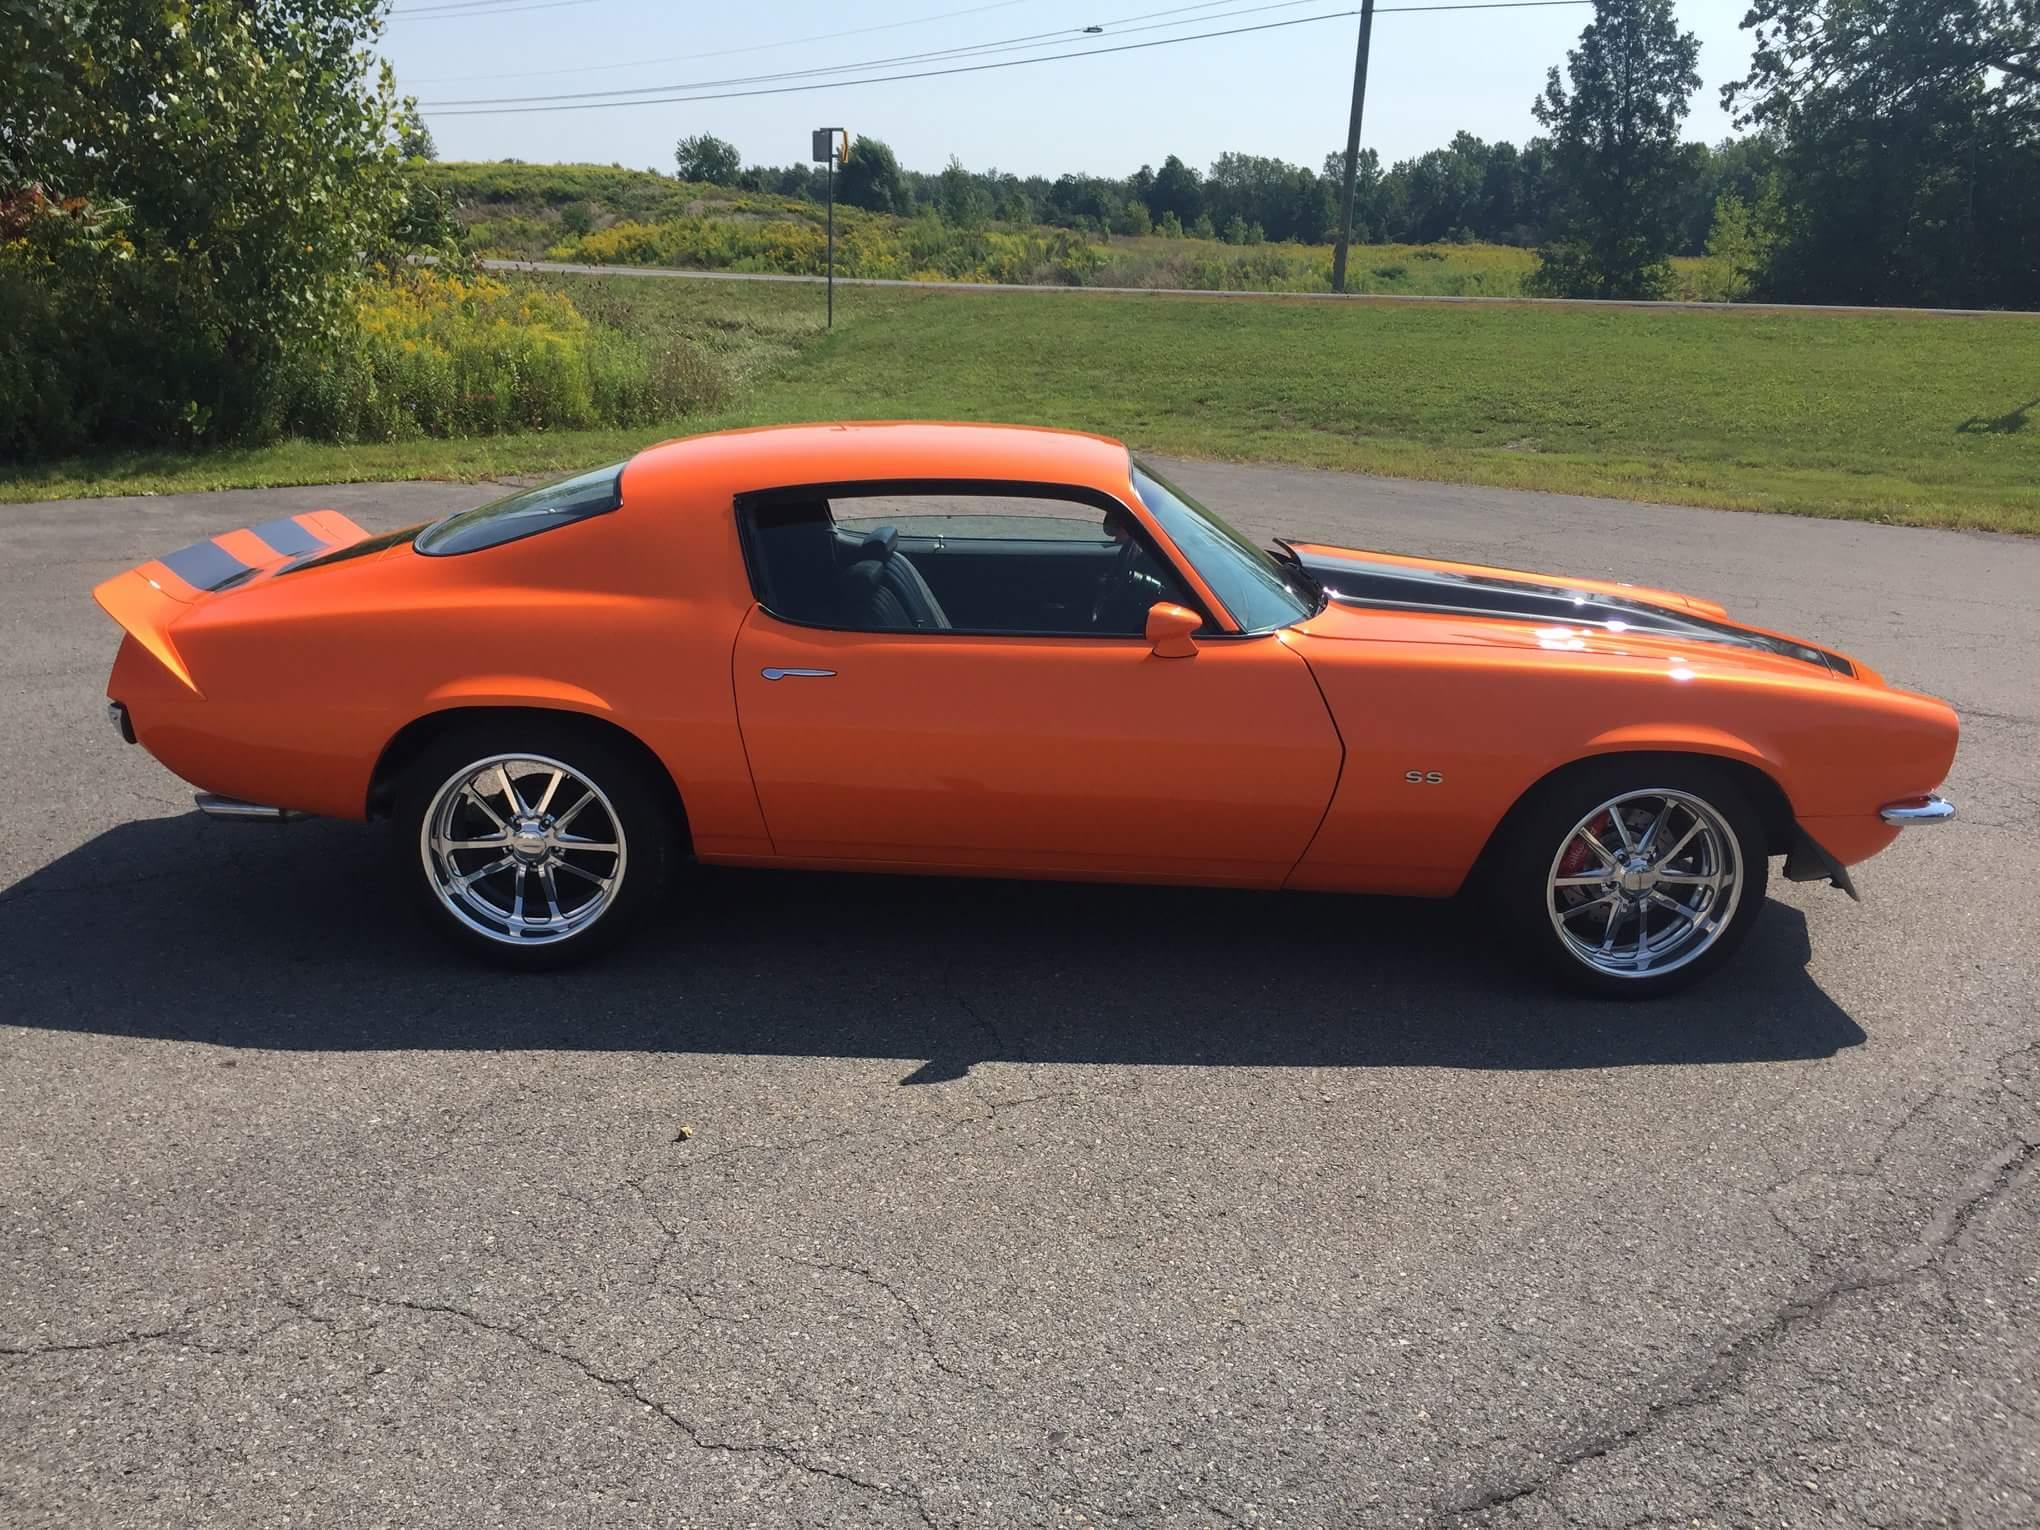 side view of orange 1970 camaro rs/ss